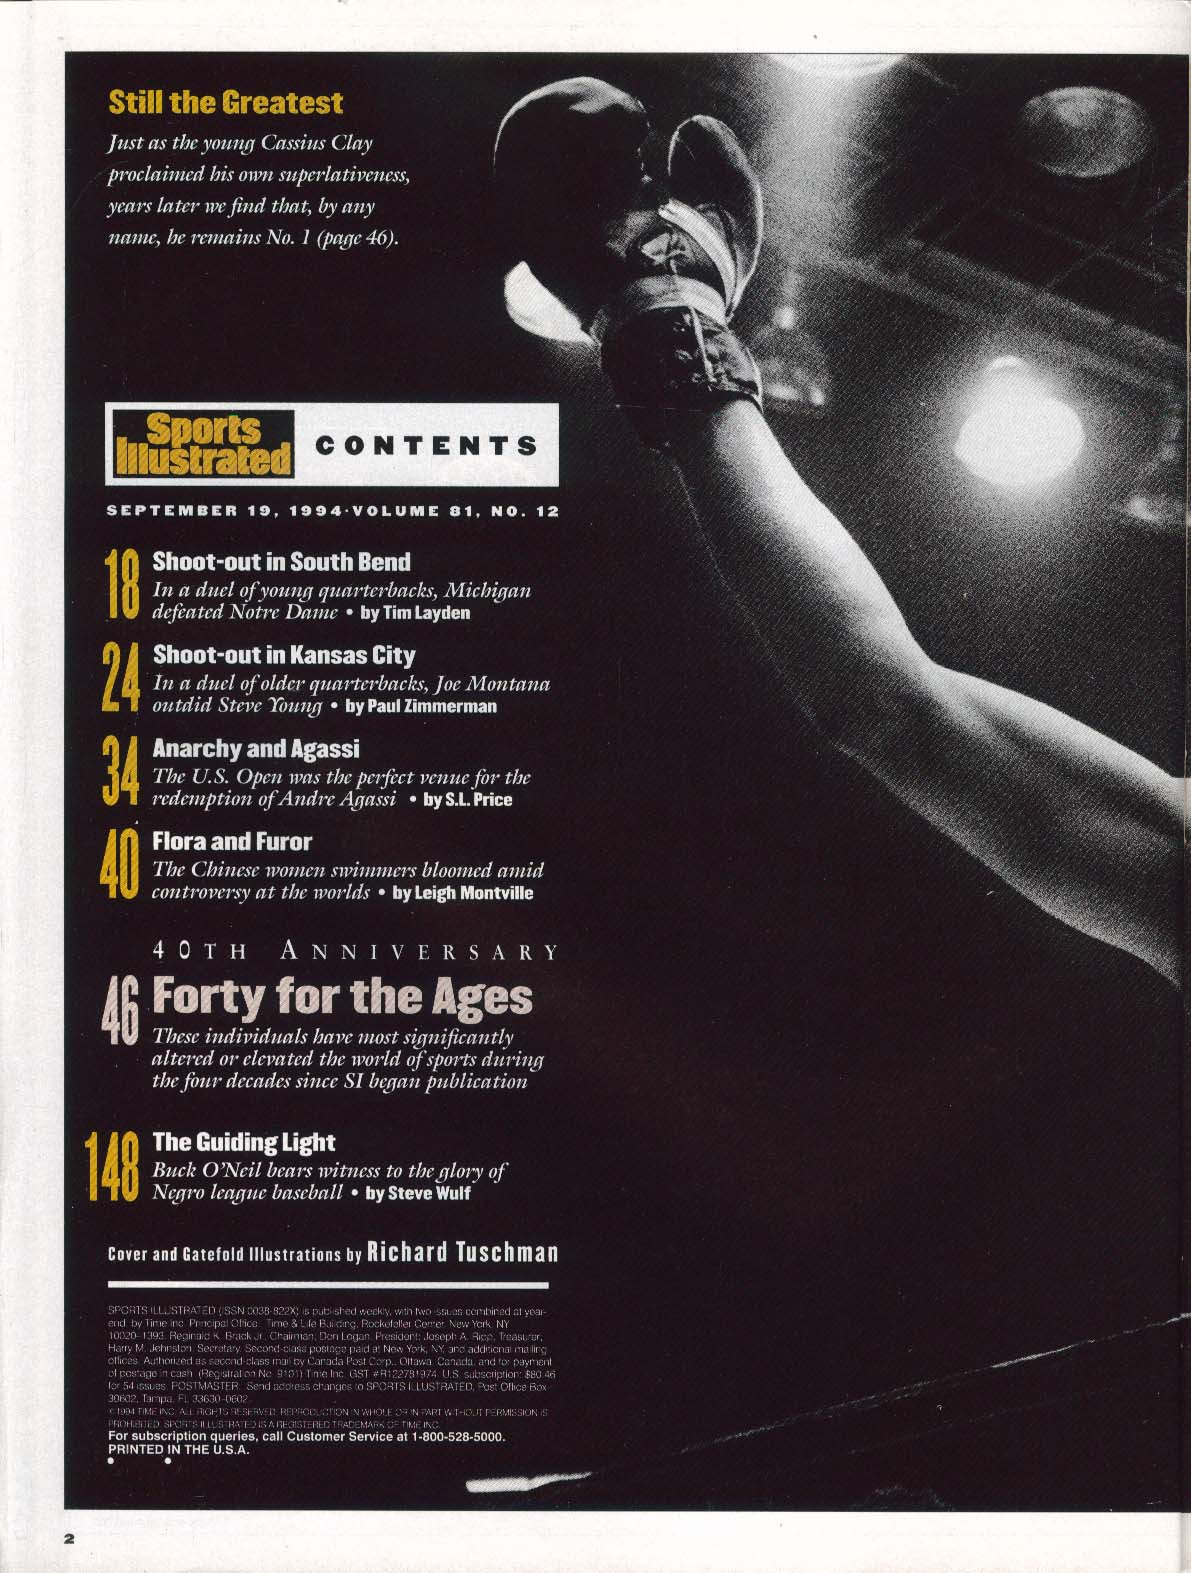 SPORTS ILLUSTRATED Hank Aaron Muhammad Ali Larry Bird Jim Brown Dr J + 9/19 1994